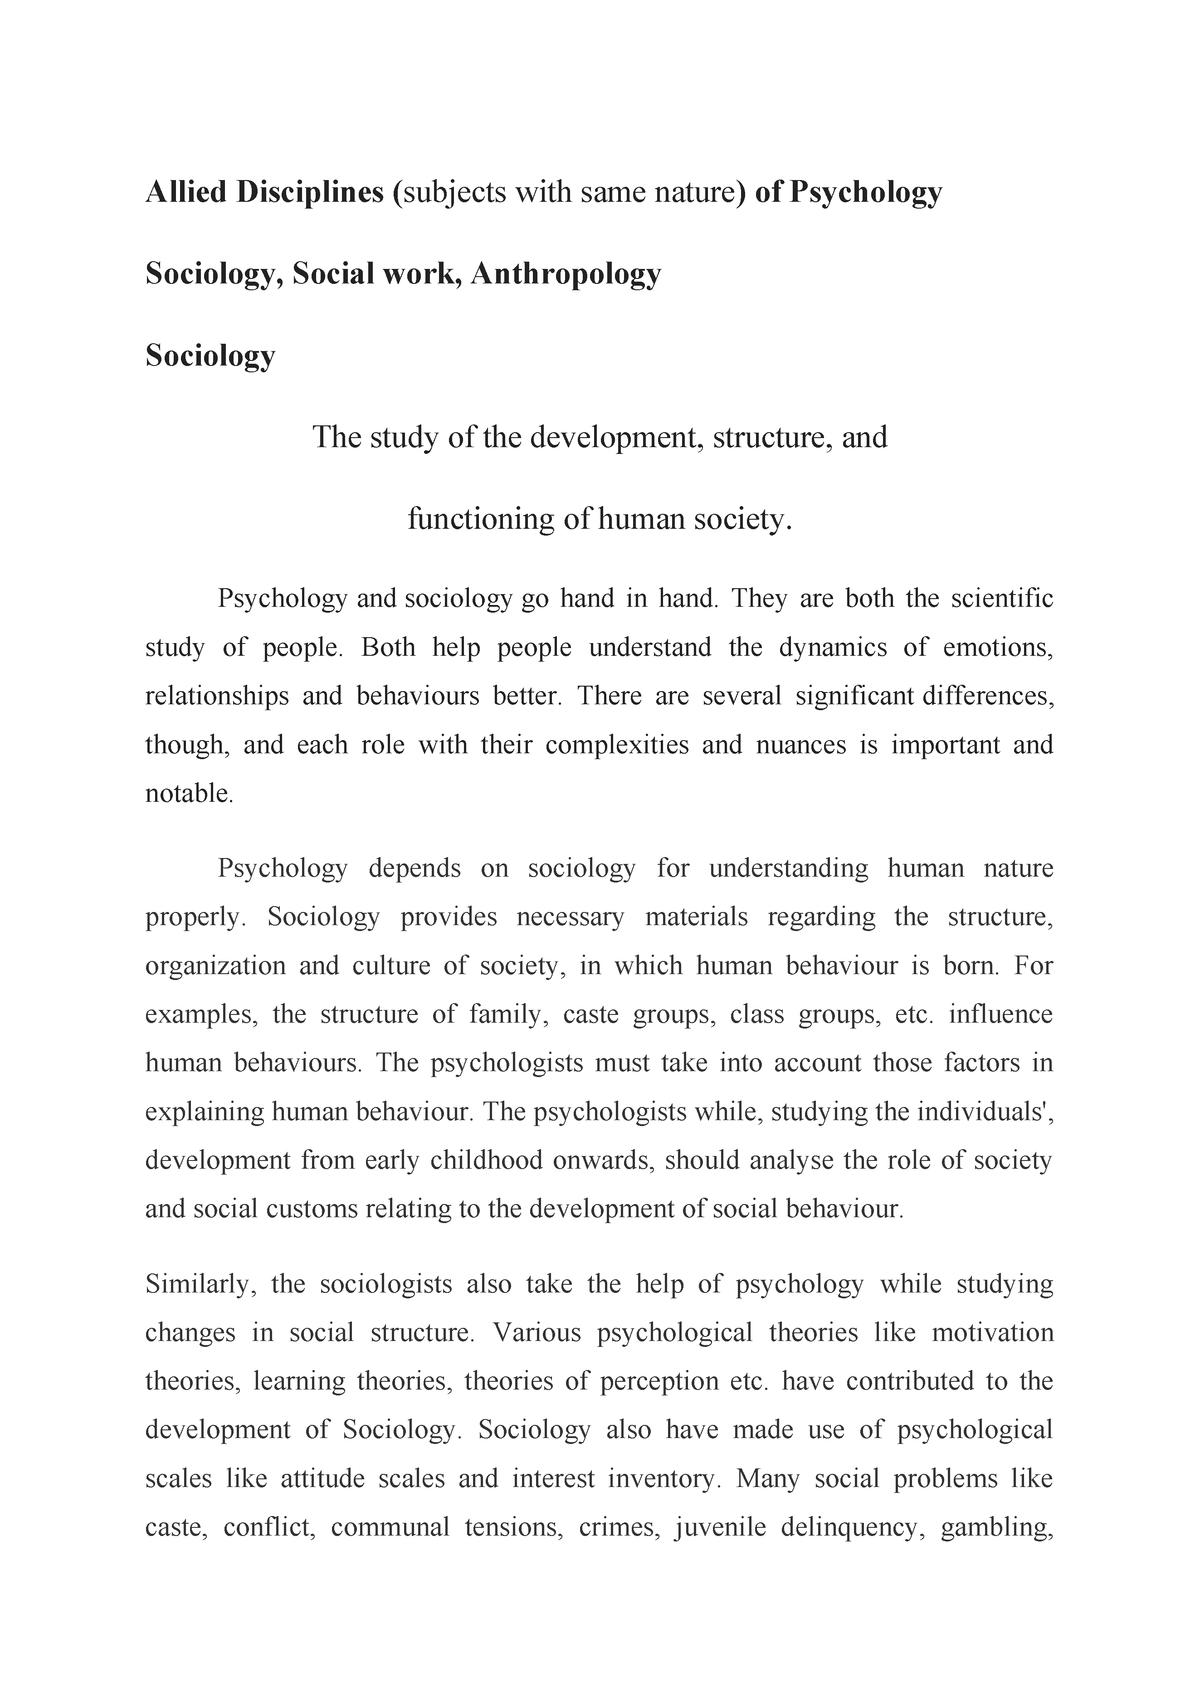 Alliedd disciplines - Lecture notes 1 - SOC-524: Social